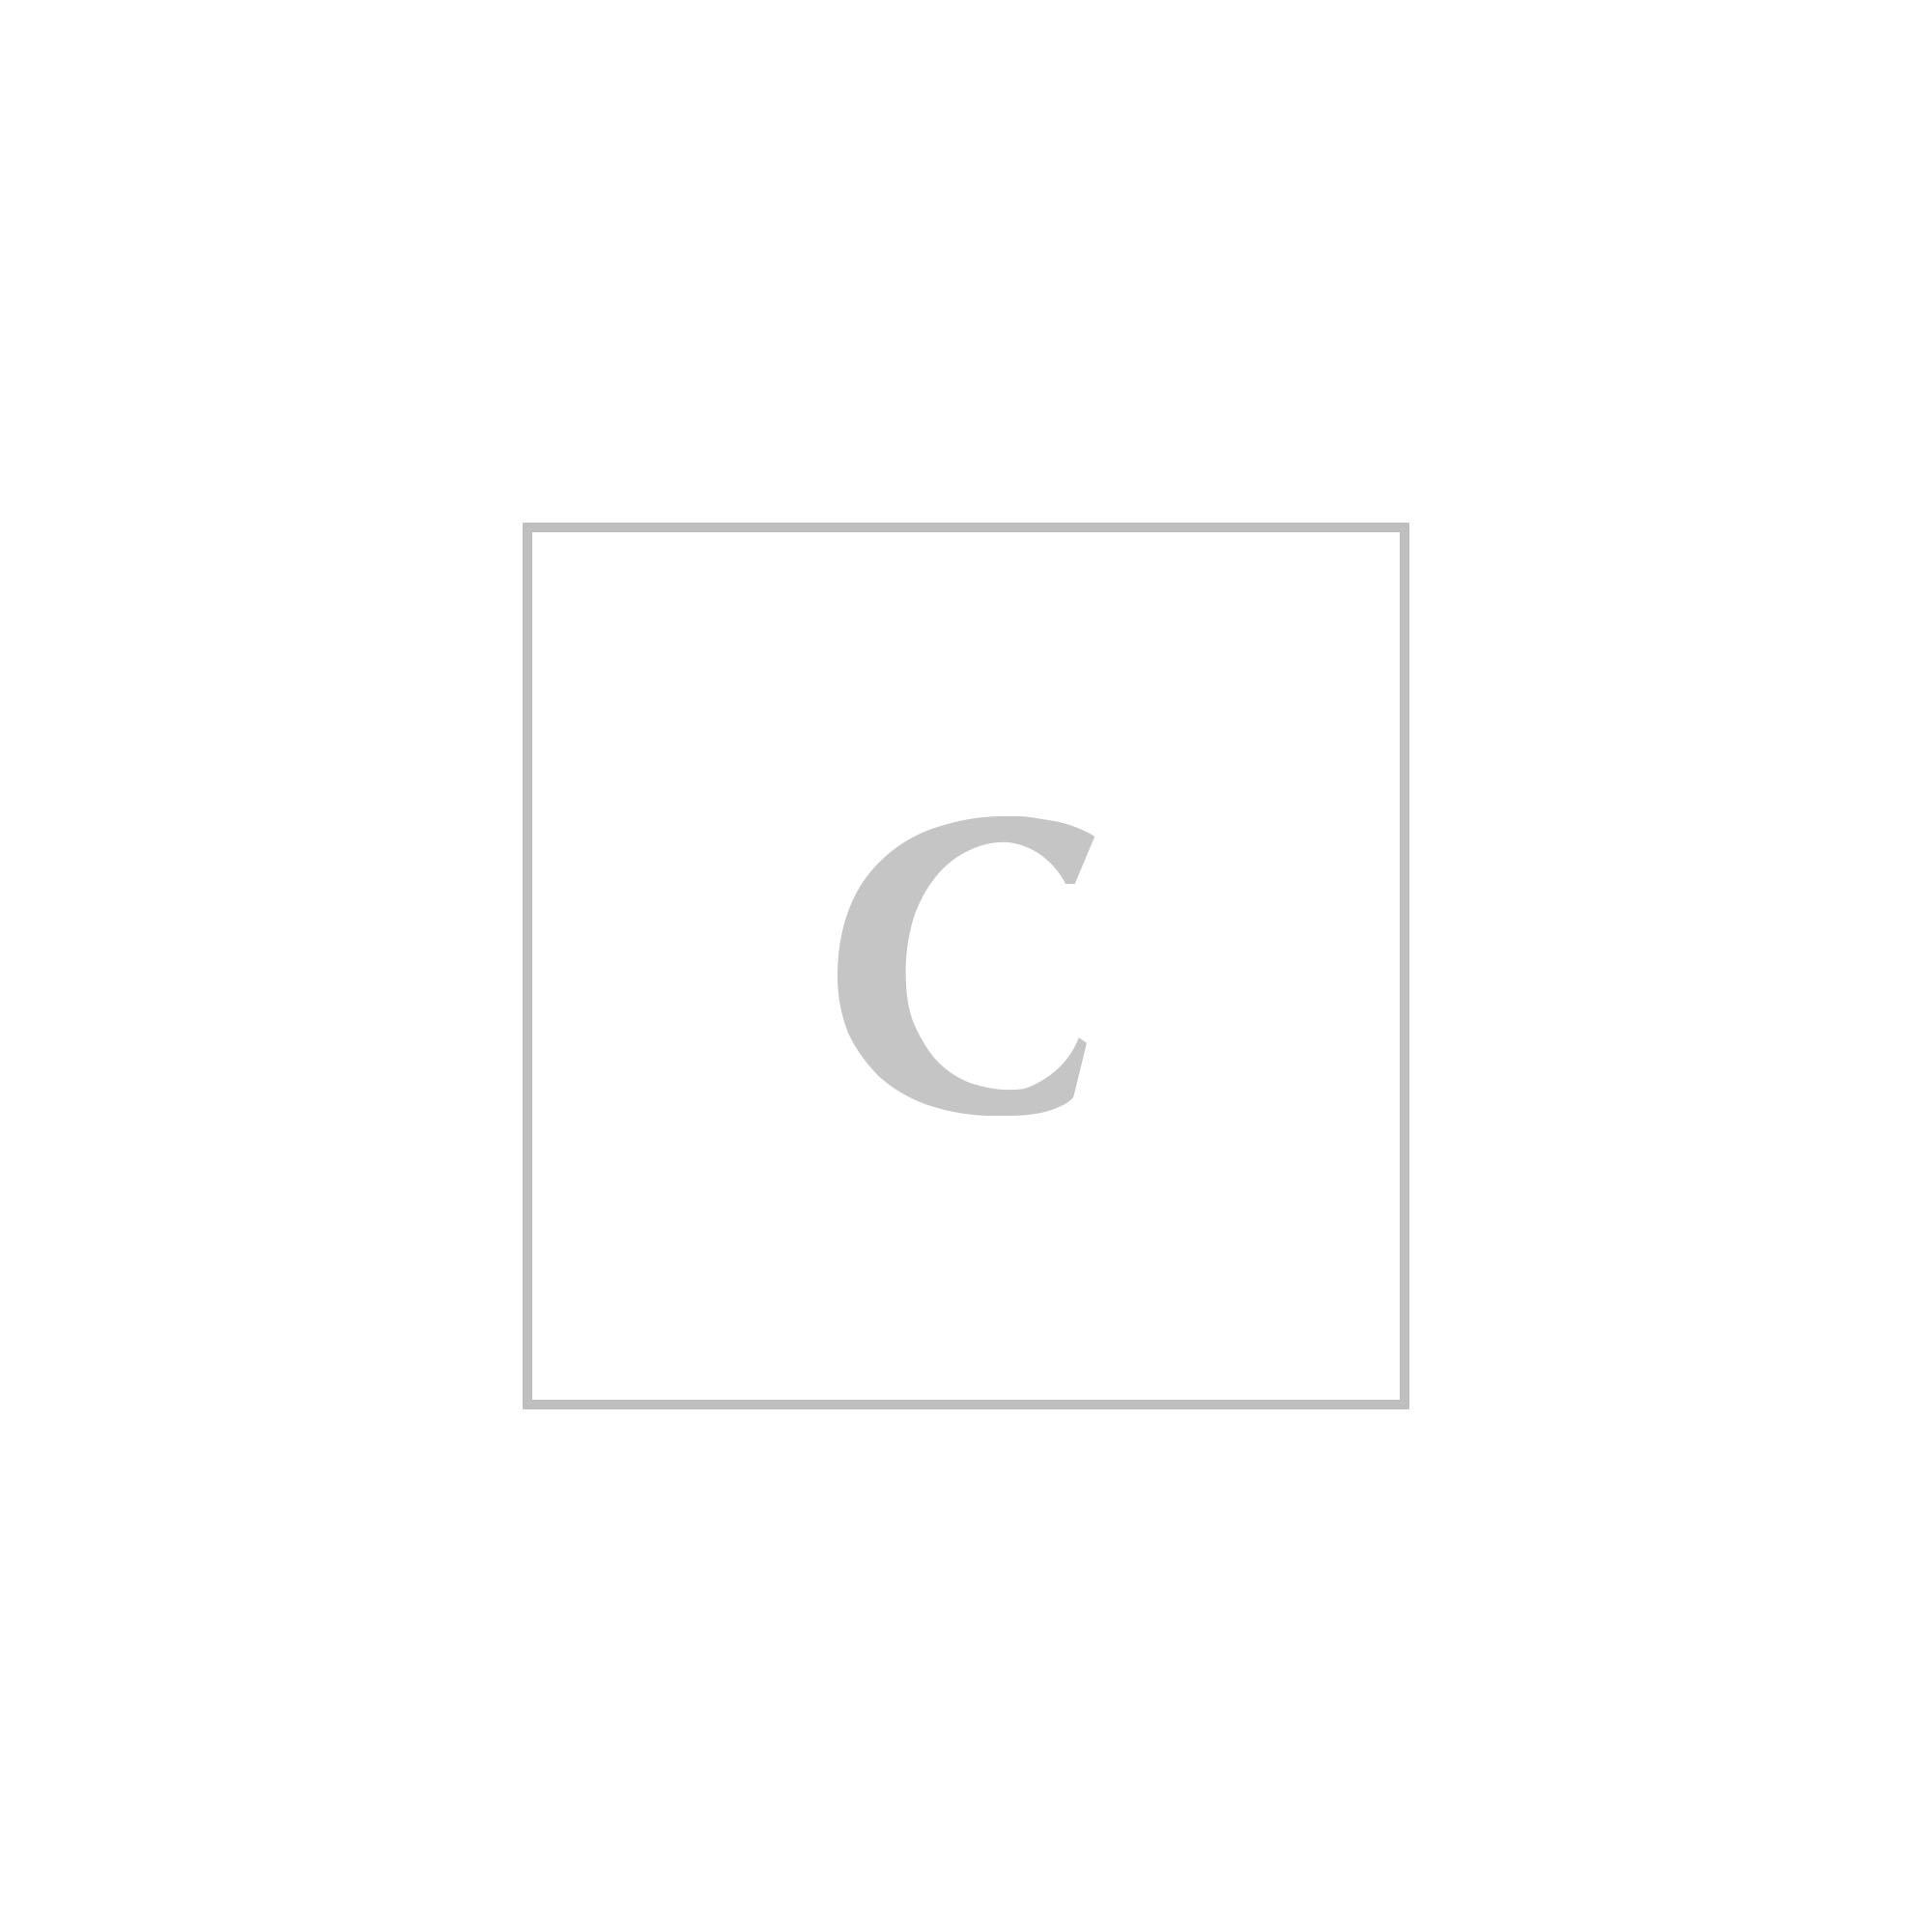 Balmain cerniere clutch with logo